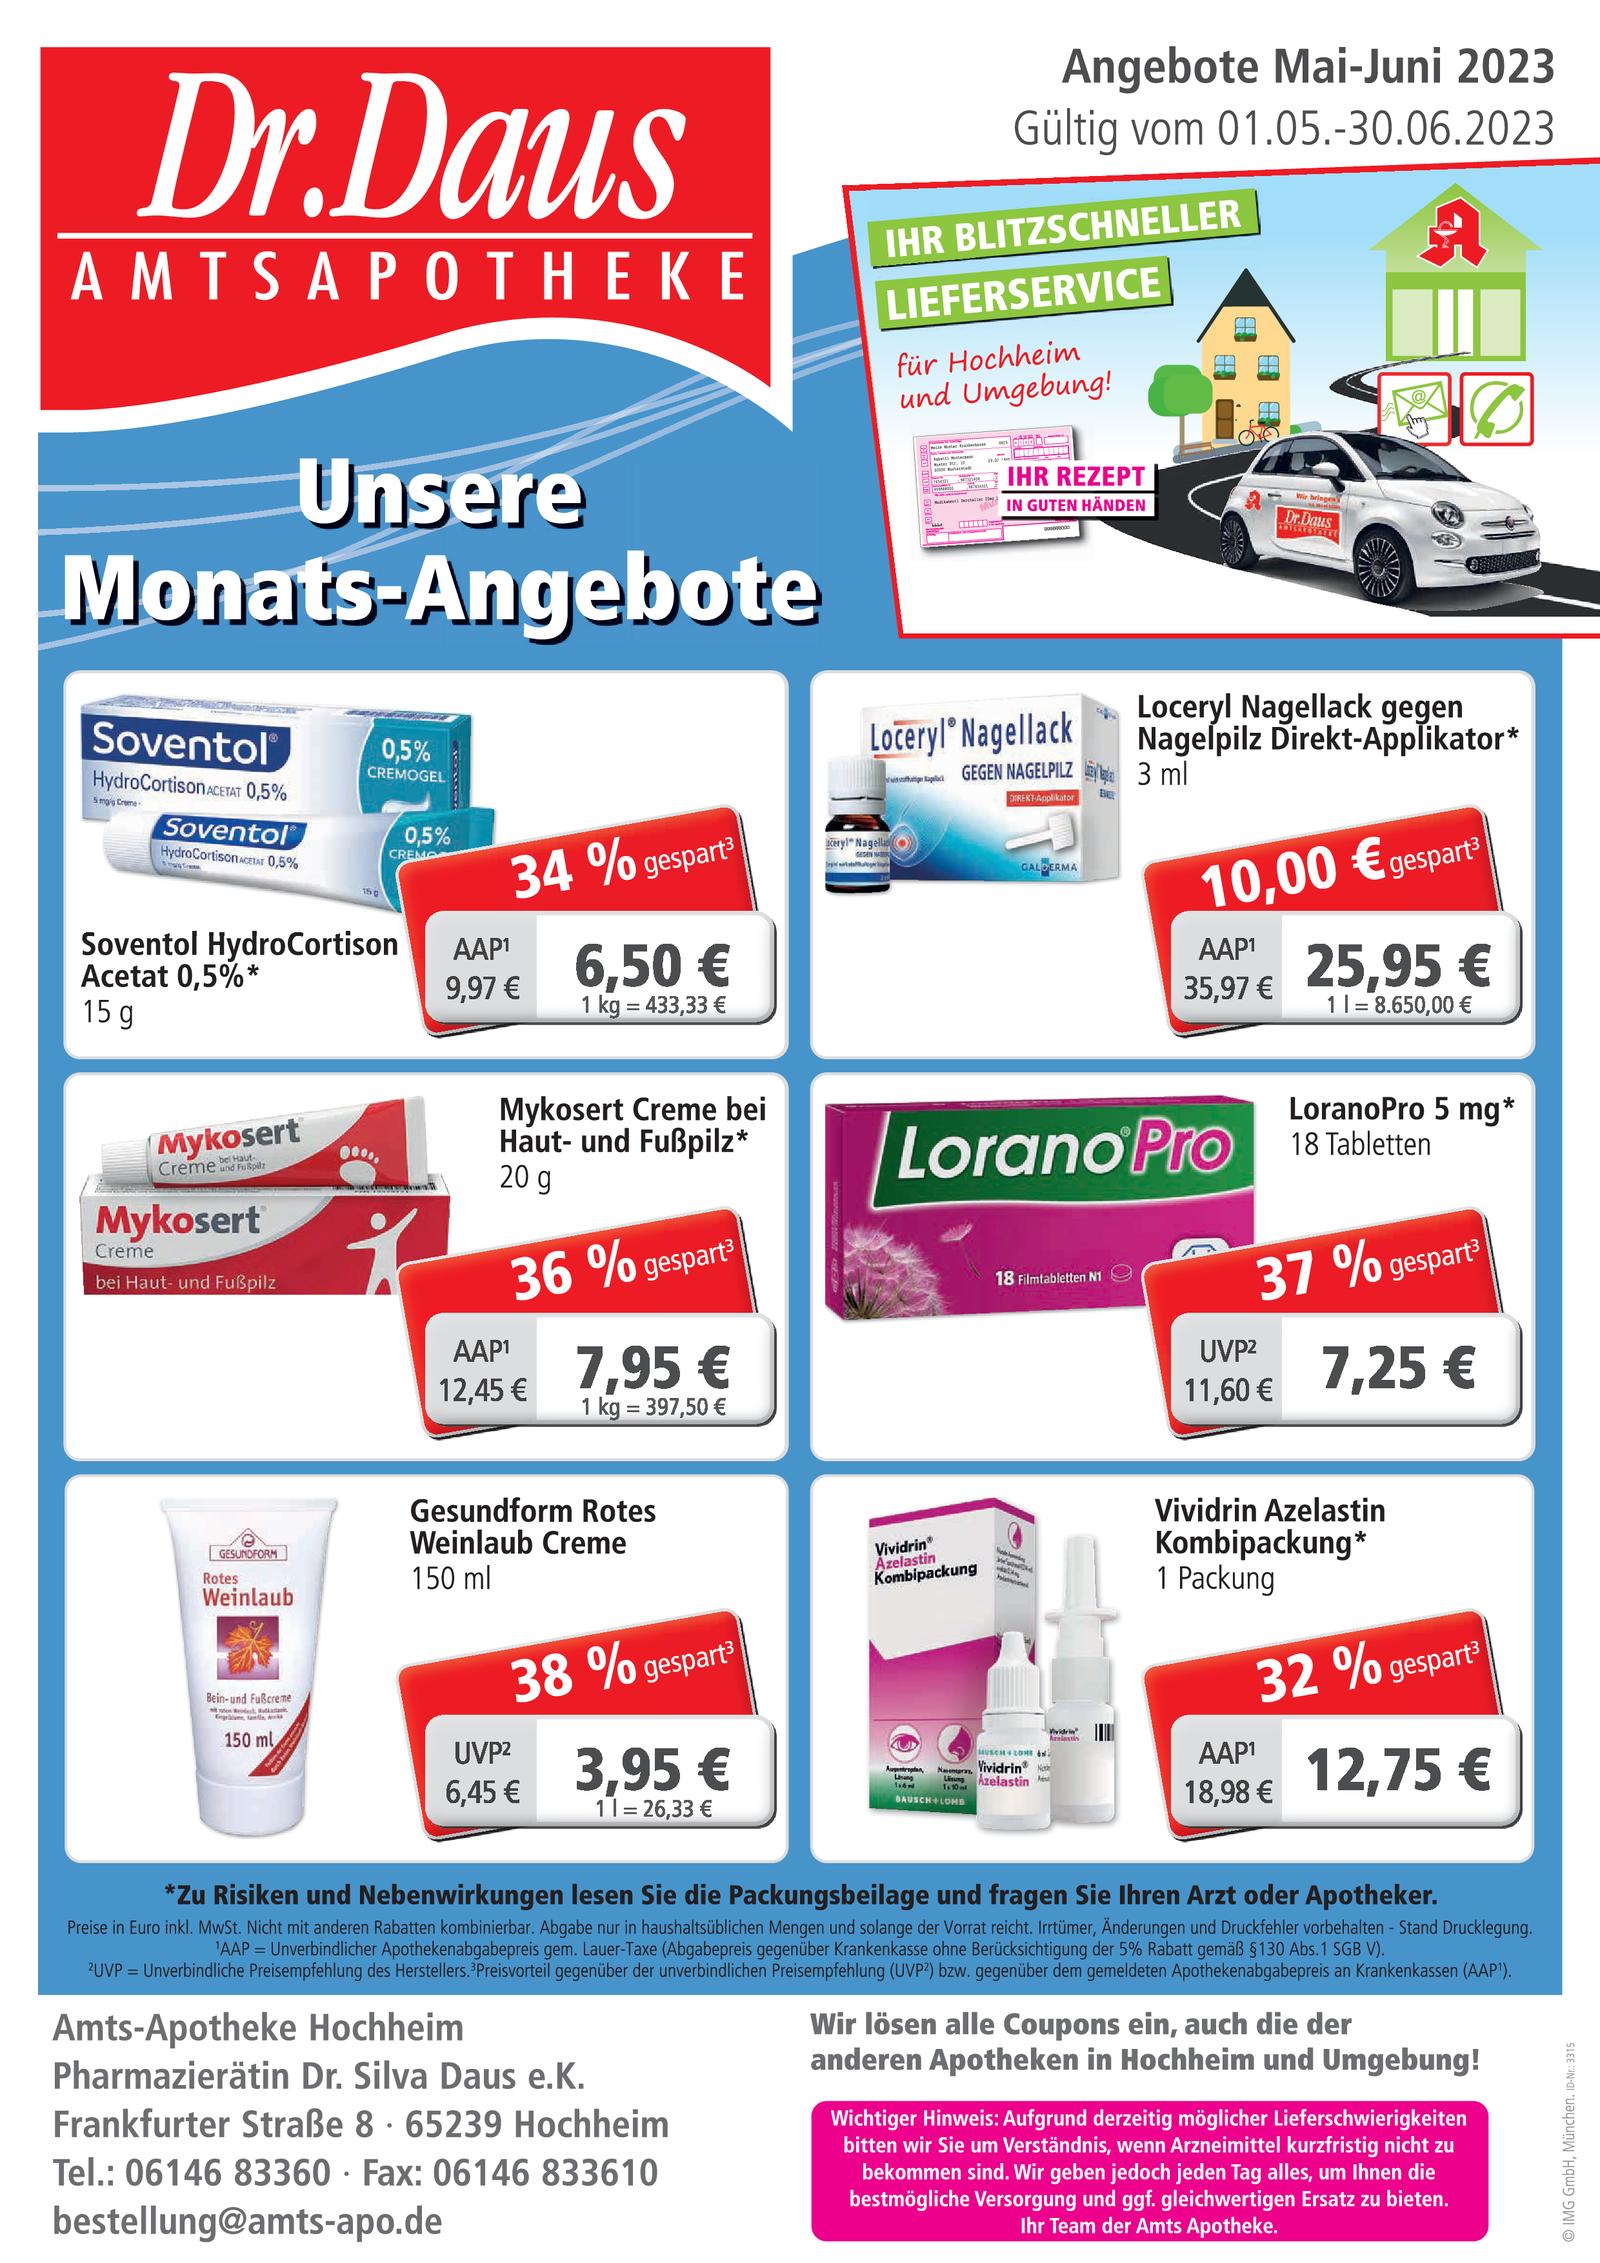 https://mein-uploads.apocdn.net/12858/leaflets/12858_flyer-Seite1.png